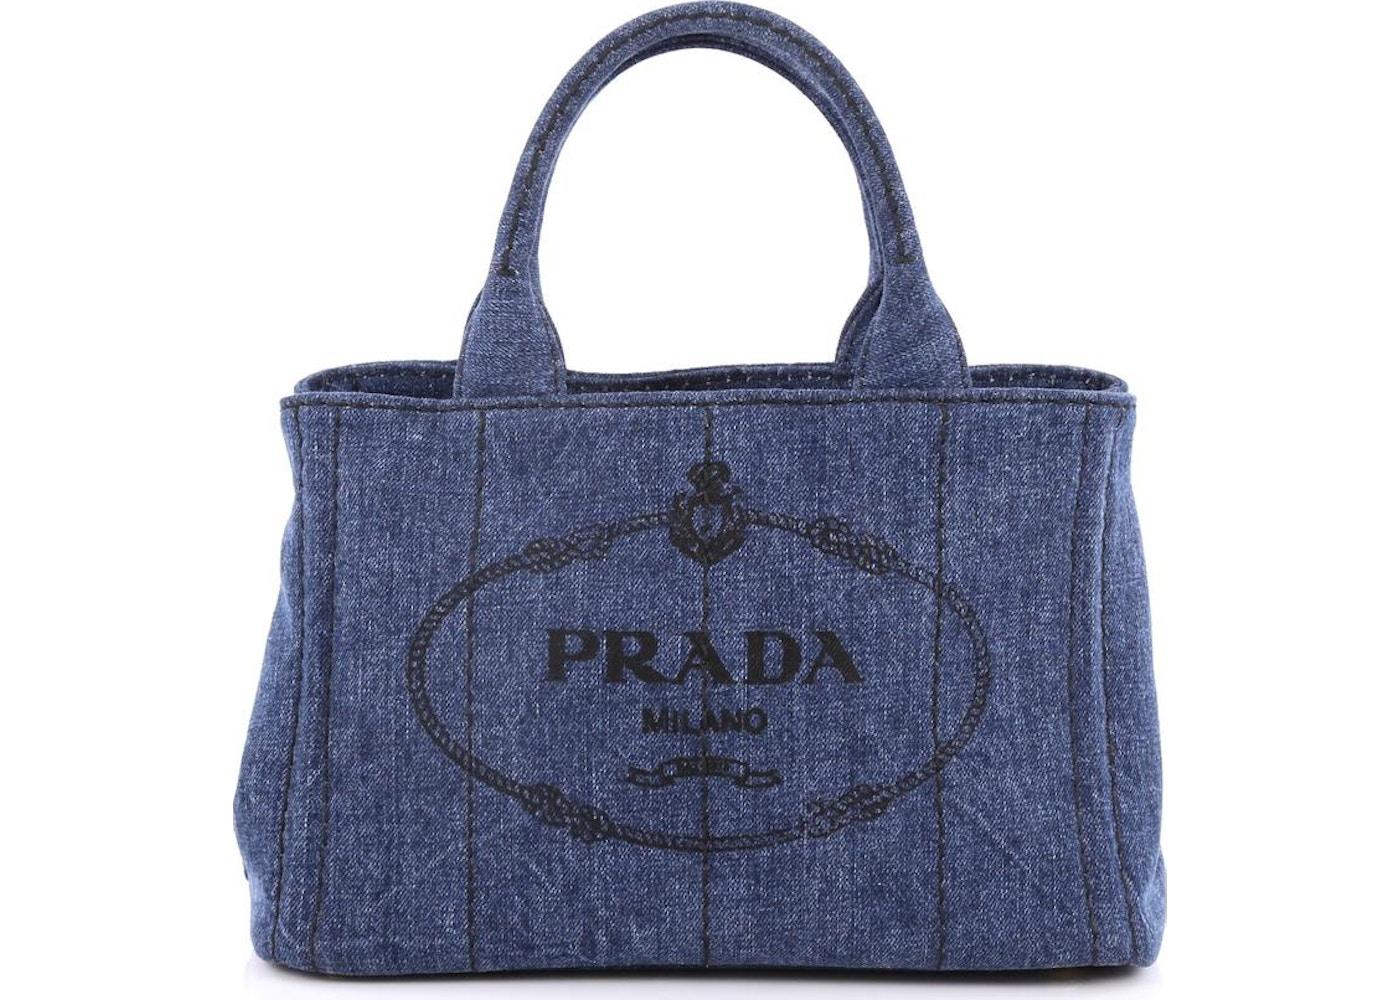 4d465ac38a13 Prada Canapa Convertible Tote Embossed Logo Mini Blue